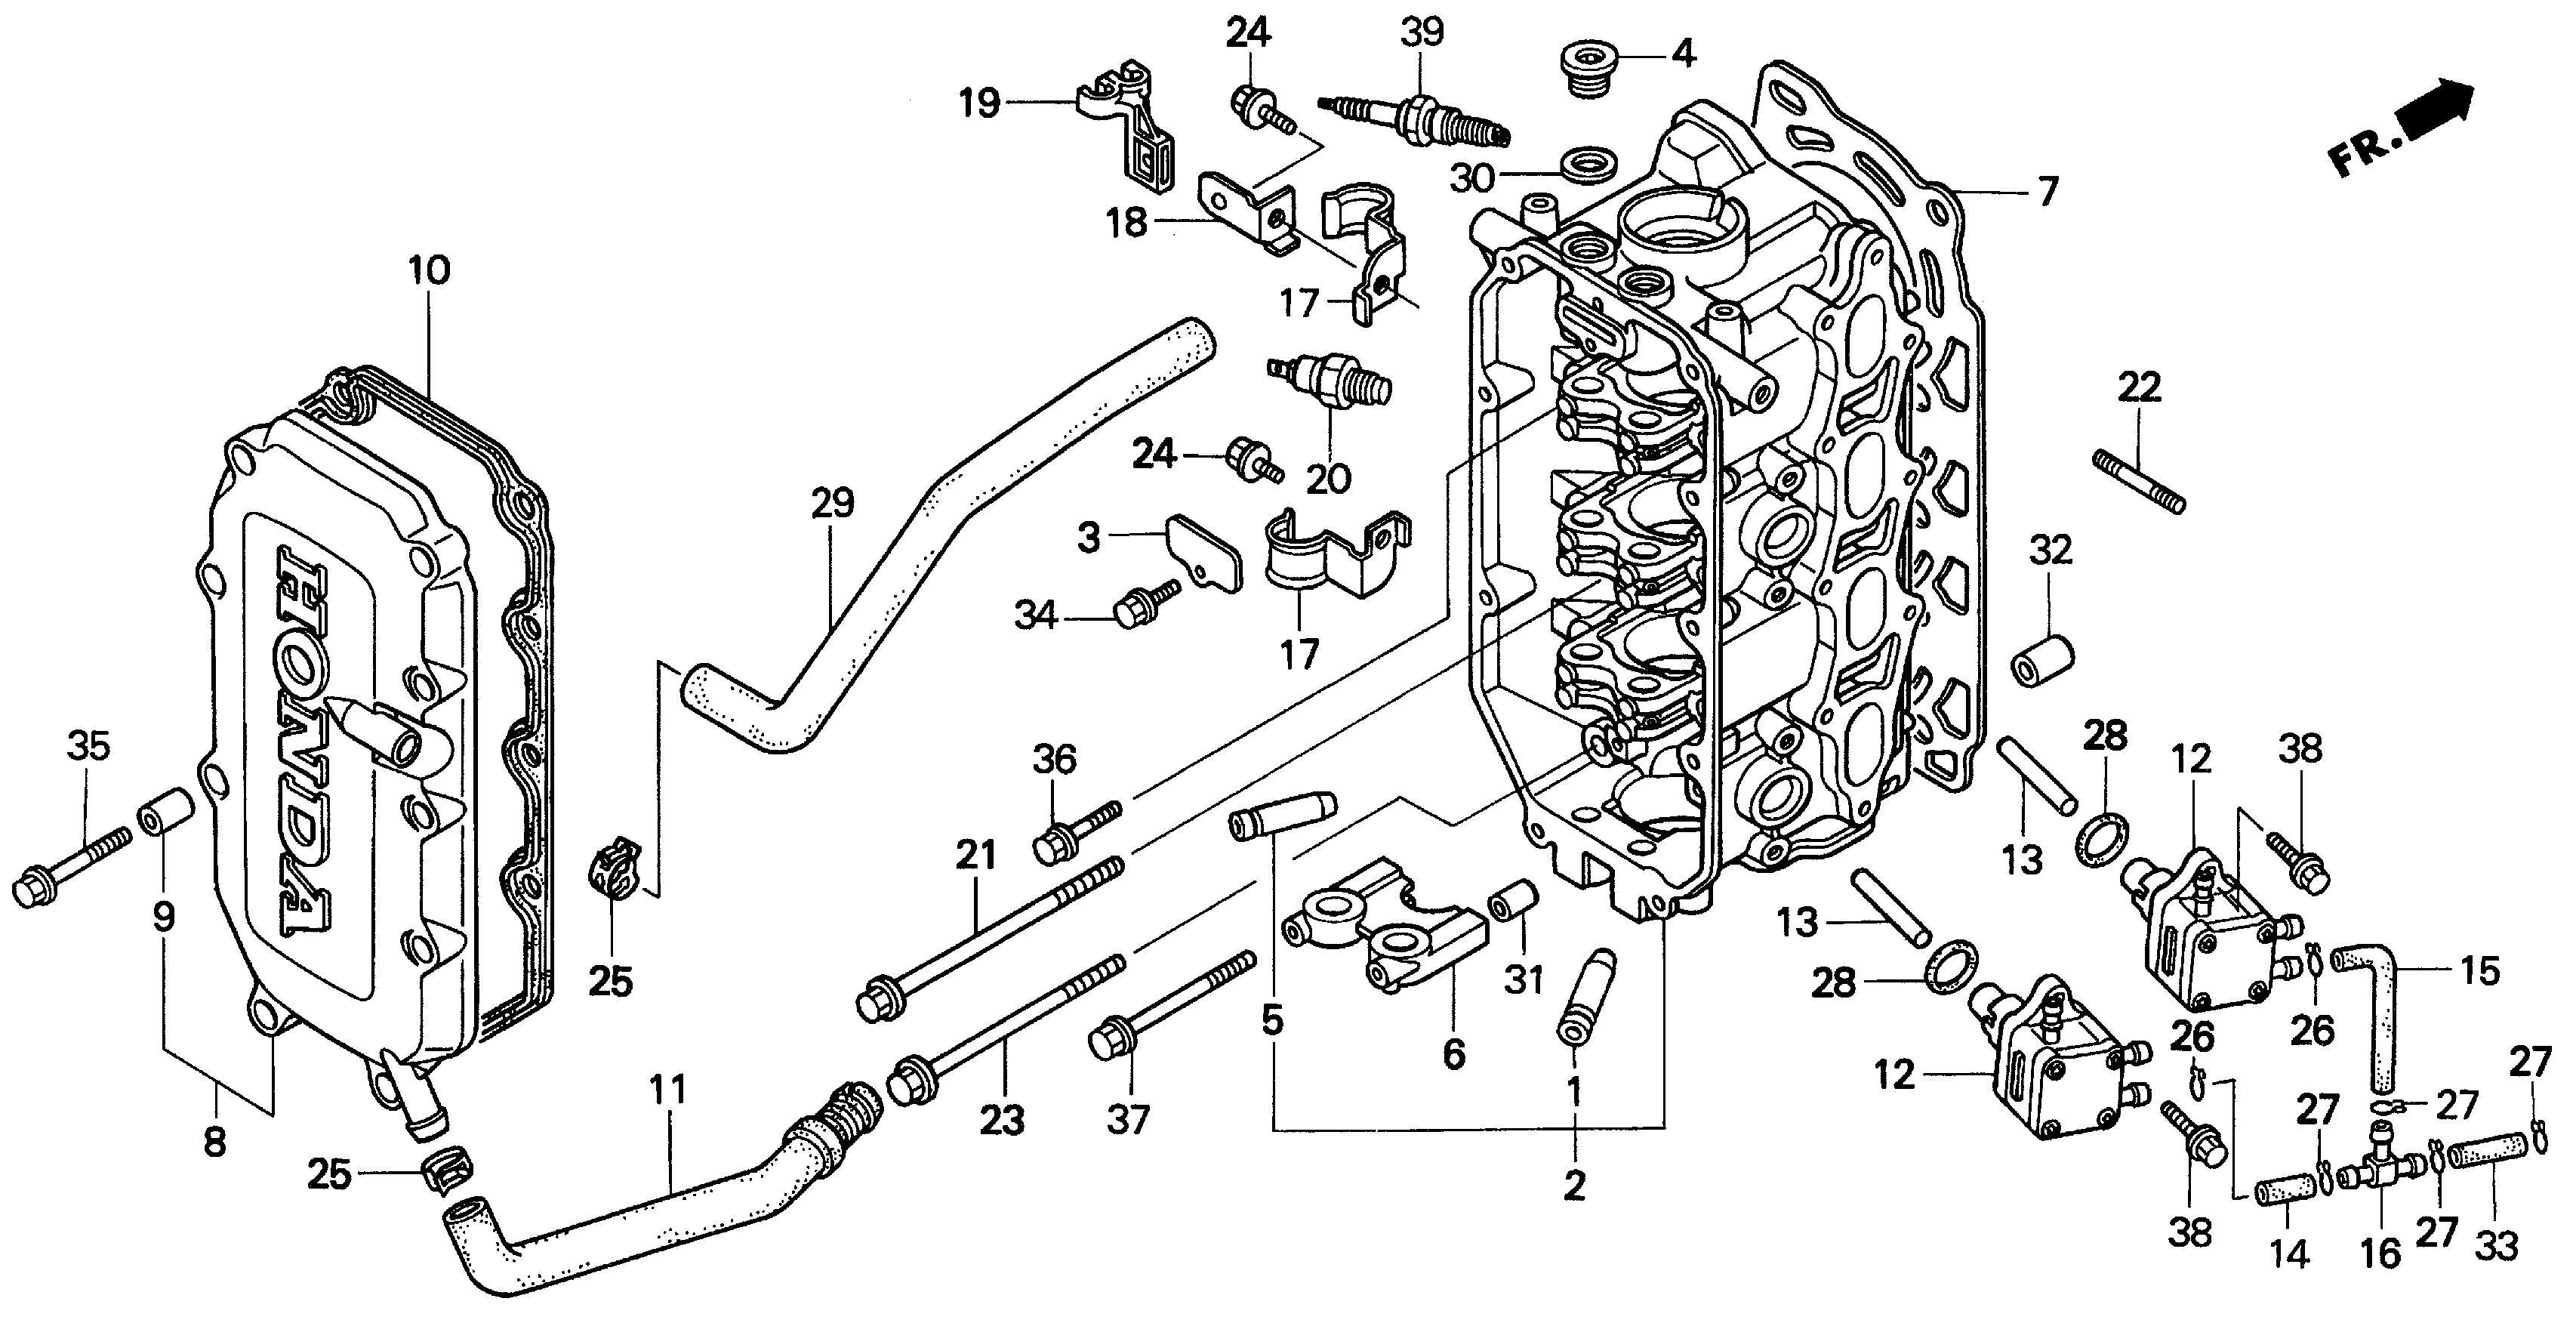 honda outboard parts diagram honda marine parts look up